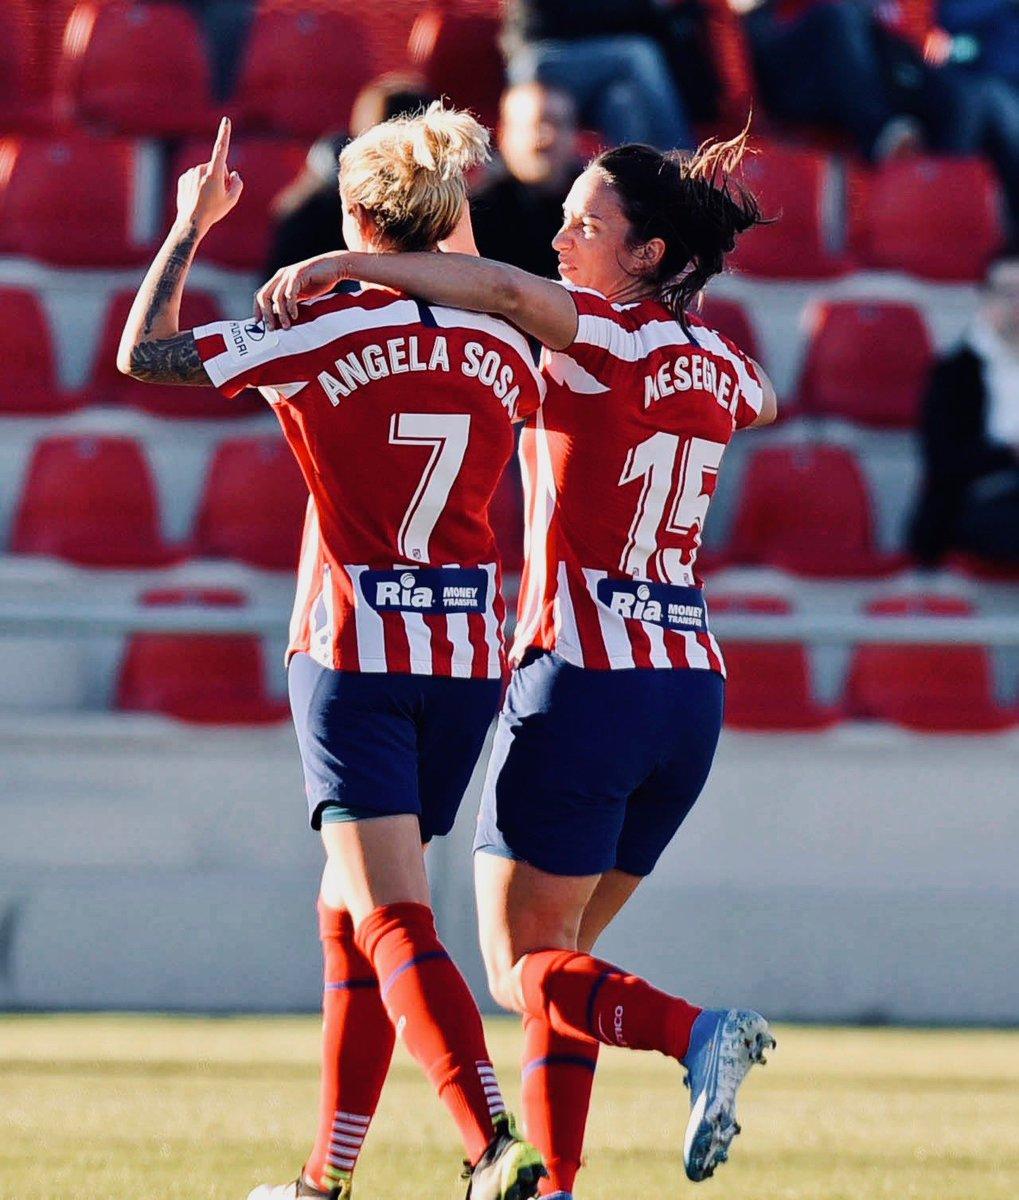 ➕3️⃣‼️  A seguir mejorando ⚒ #teamwass #pumafootball #pumaone #siempreatleti #crownnutrition #prokeydrinks https://t.co/mfqcCe3dfi